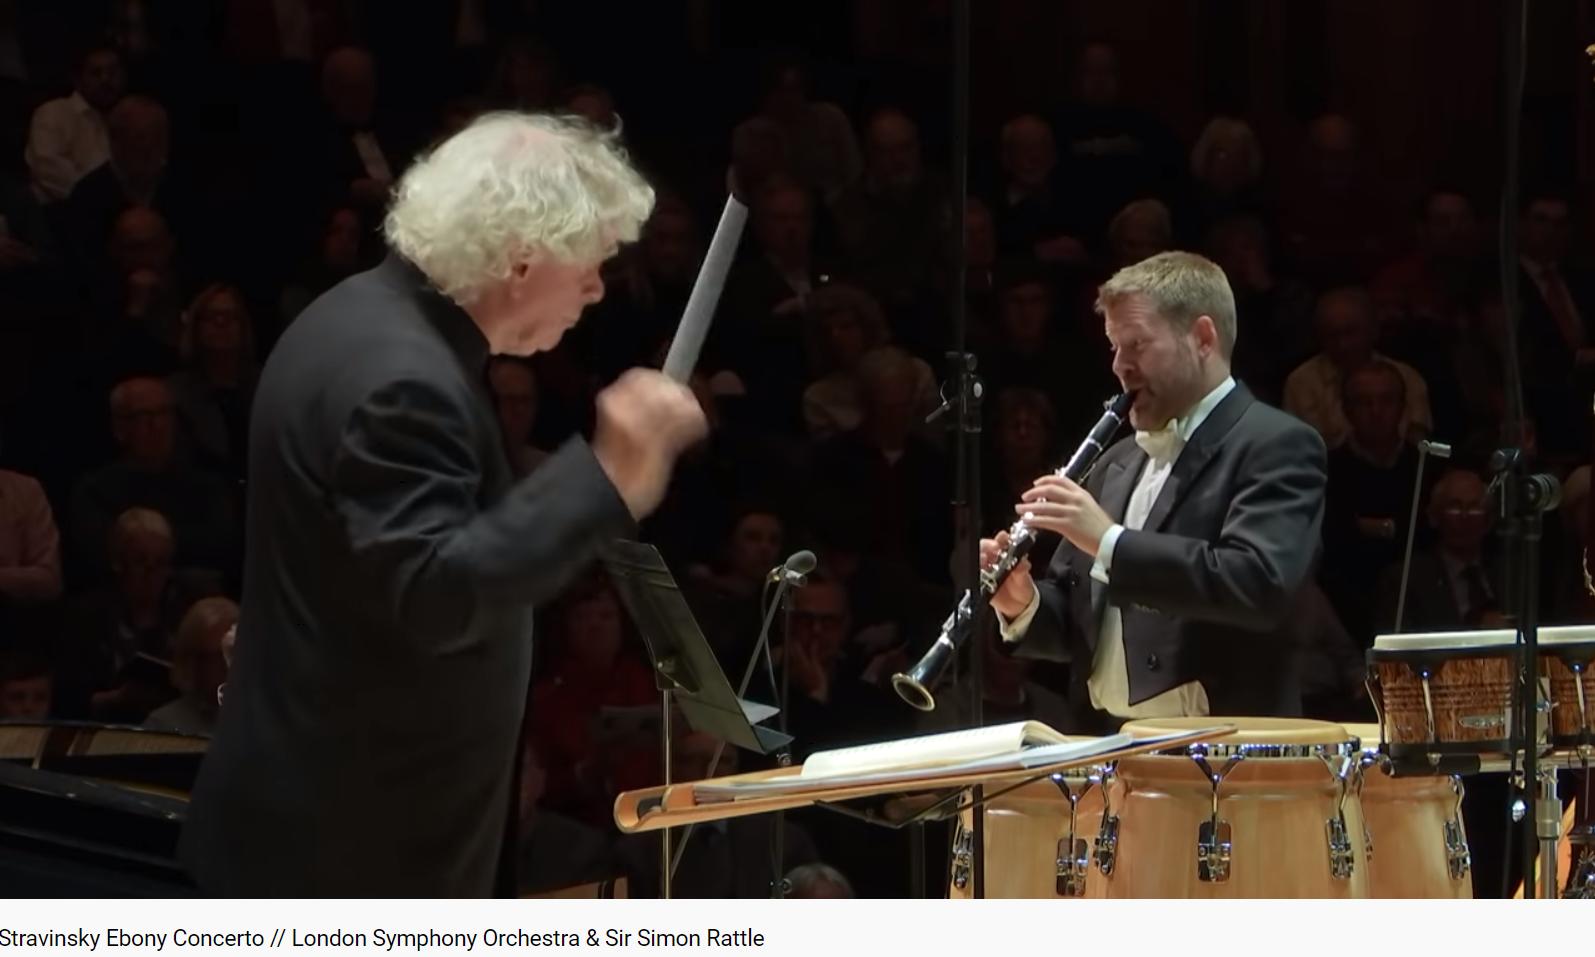 Stravinsky Ebony concerto